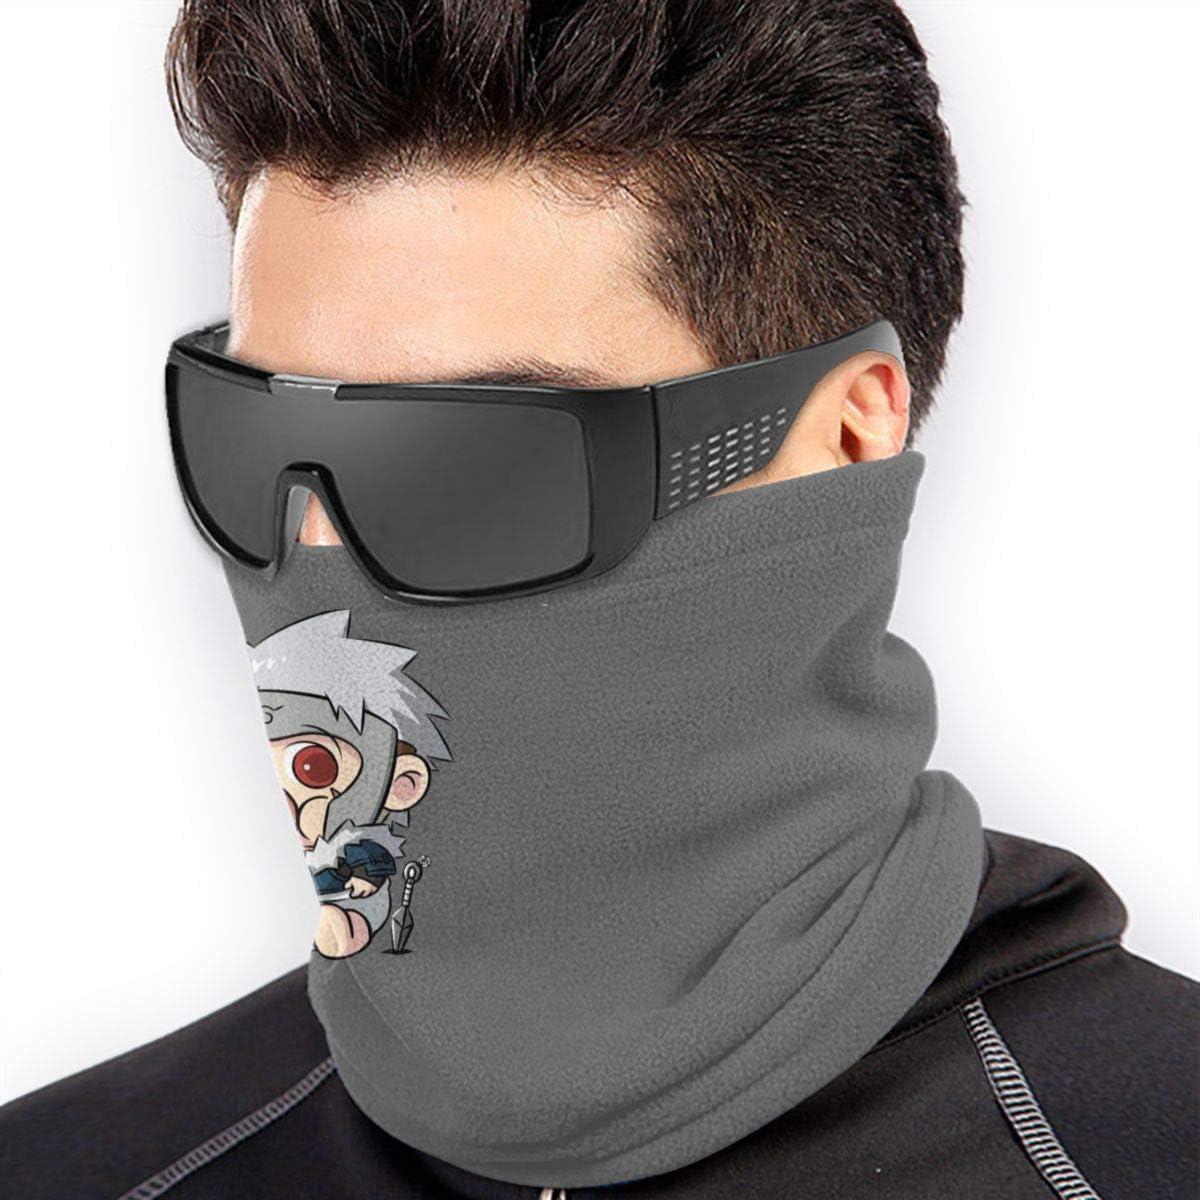 Unisex Seamless Face Mask Cartoon Shikamaru Outside Face Cover Washable Bandana for Snowboarding